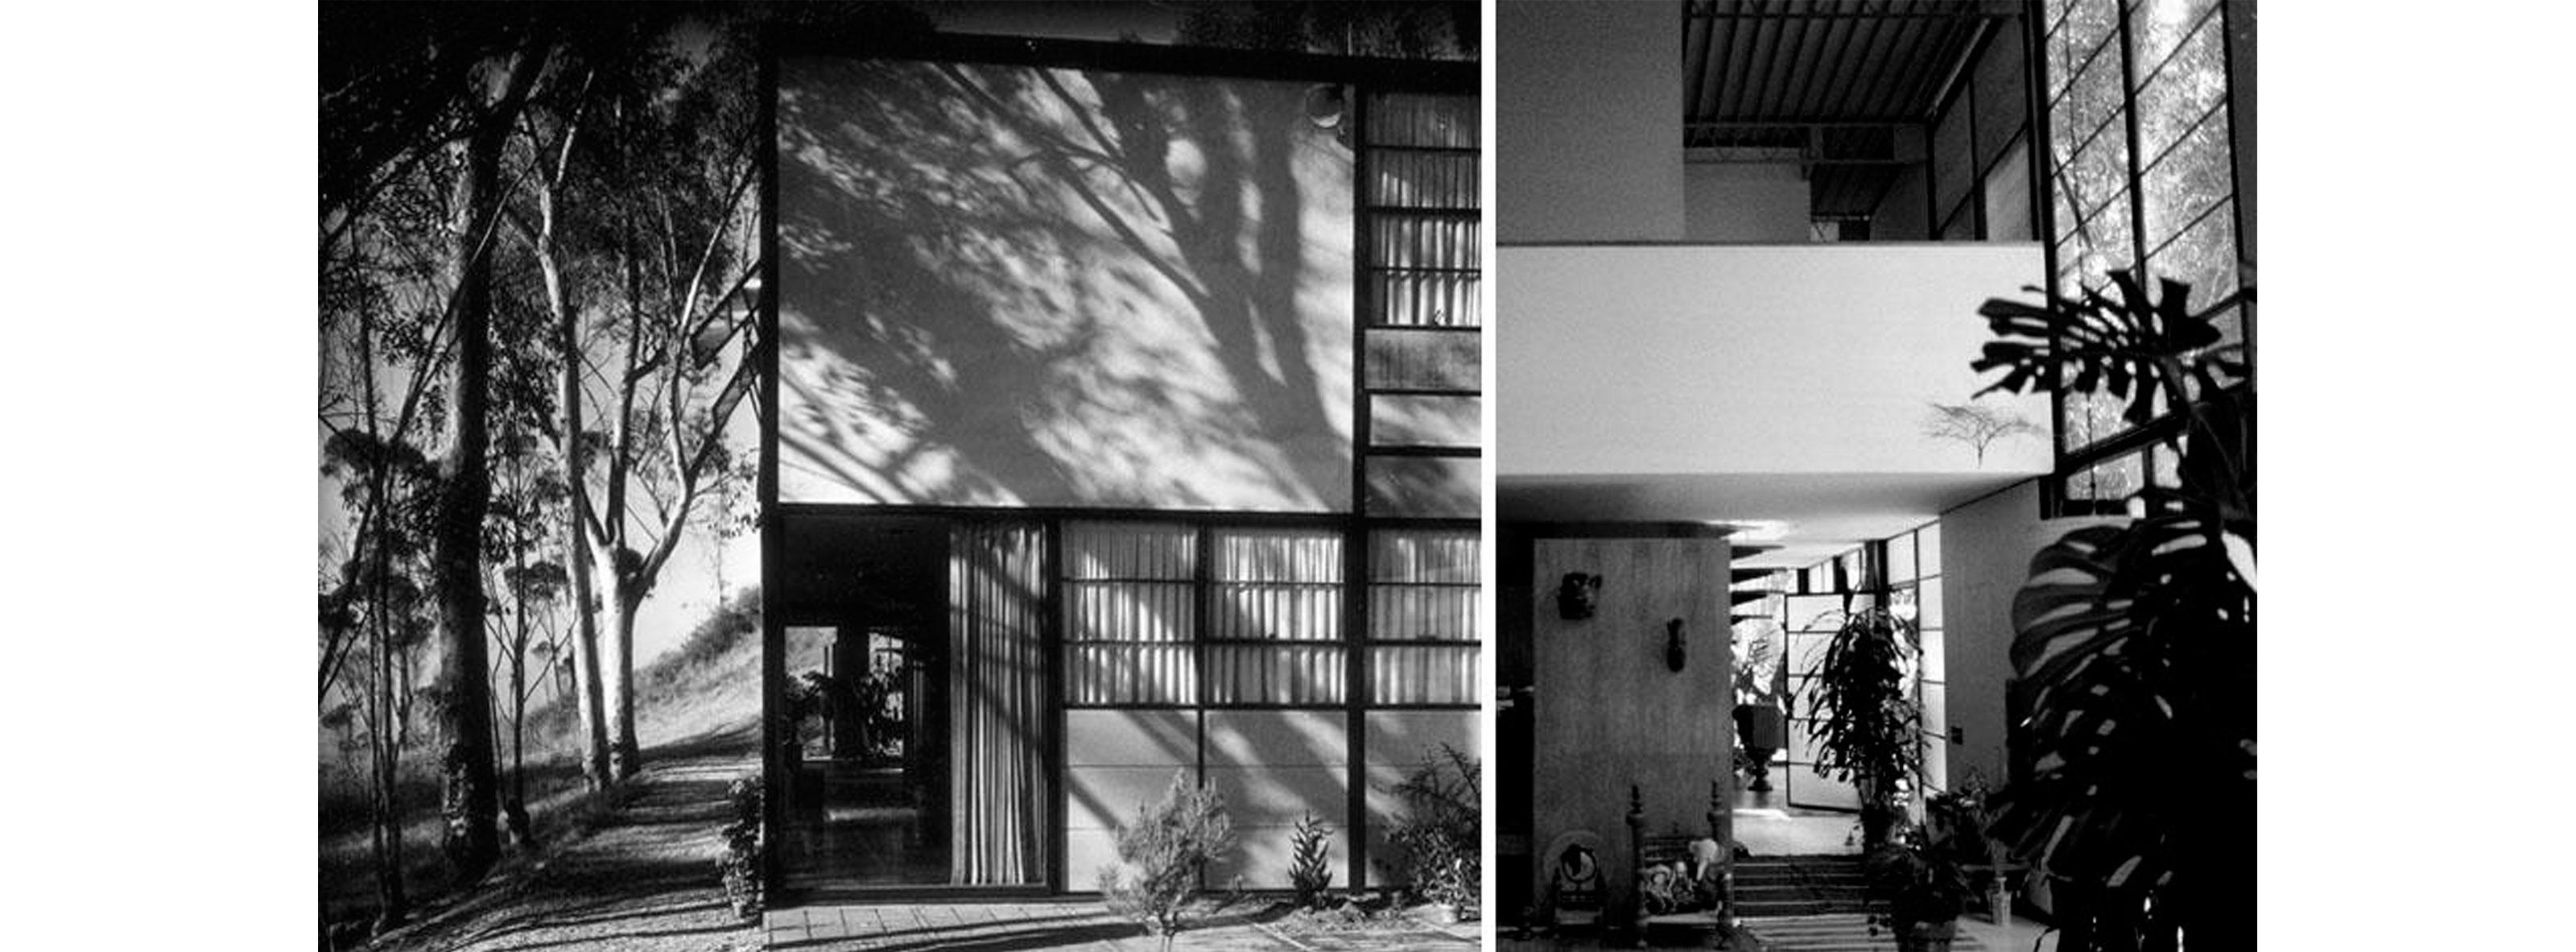 case-study-houses-8-eames-02